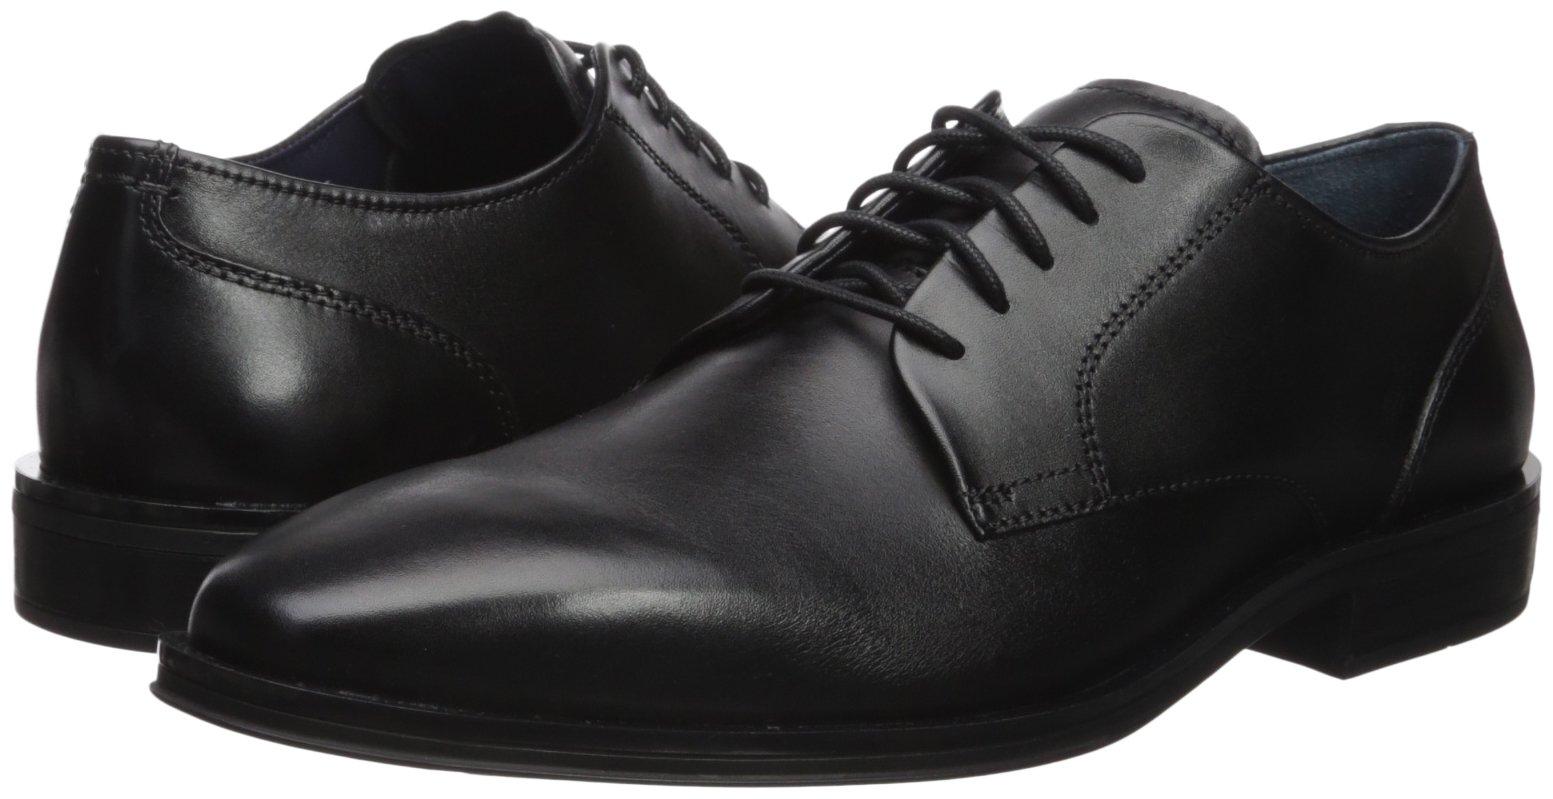 Cole Haan Men's Dawes Grand Plain Toe Oxford, Black, 11 Medium US by Cole Haan (Image #6)